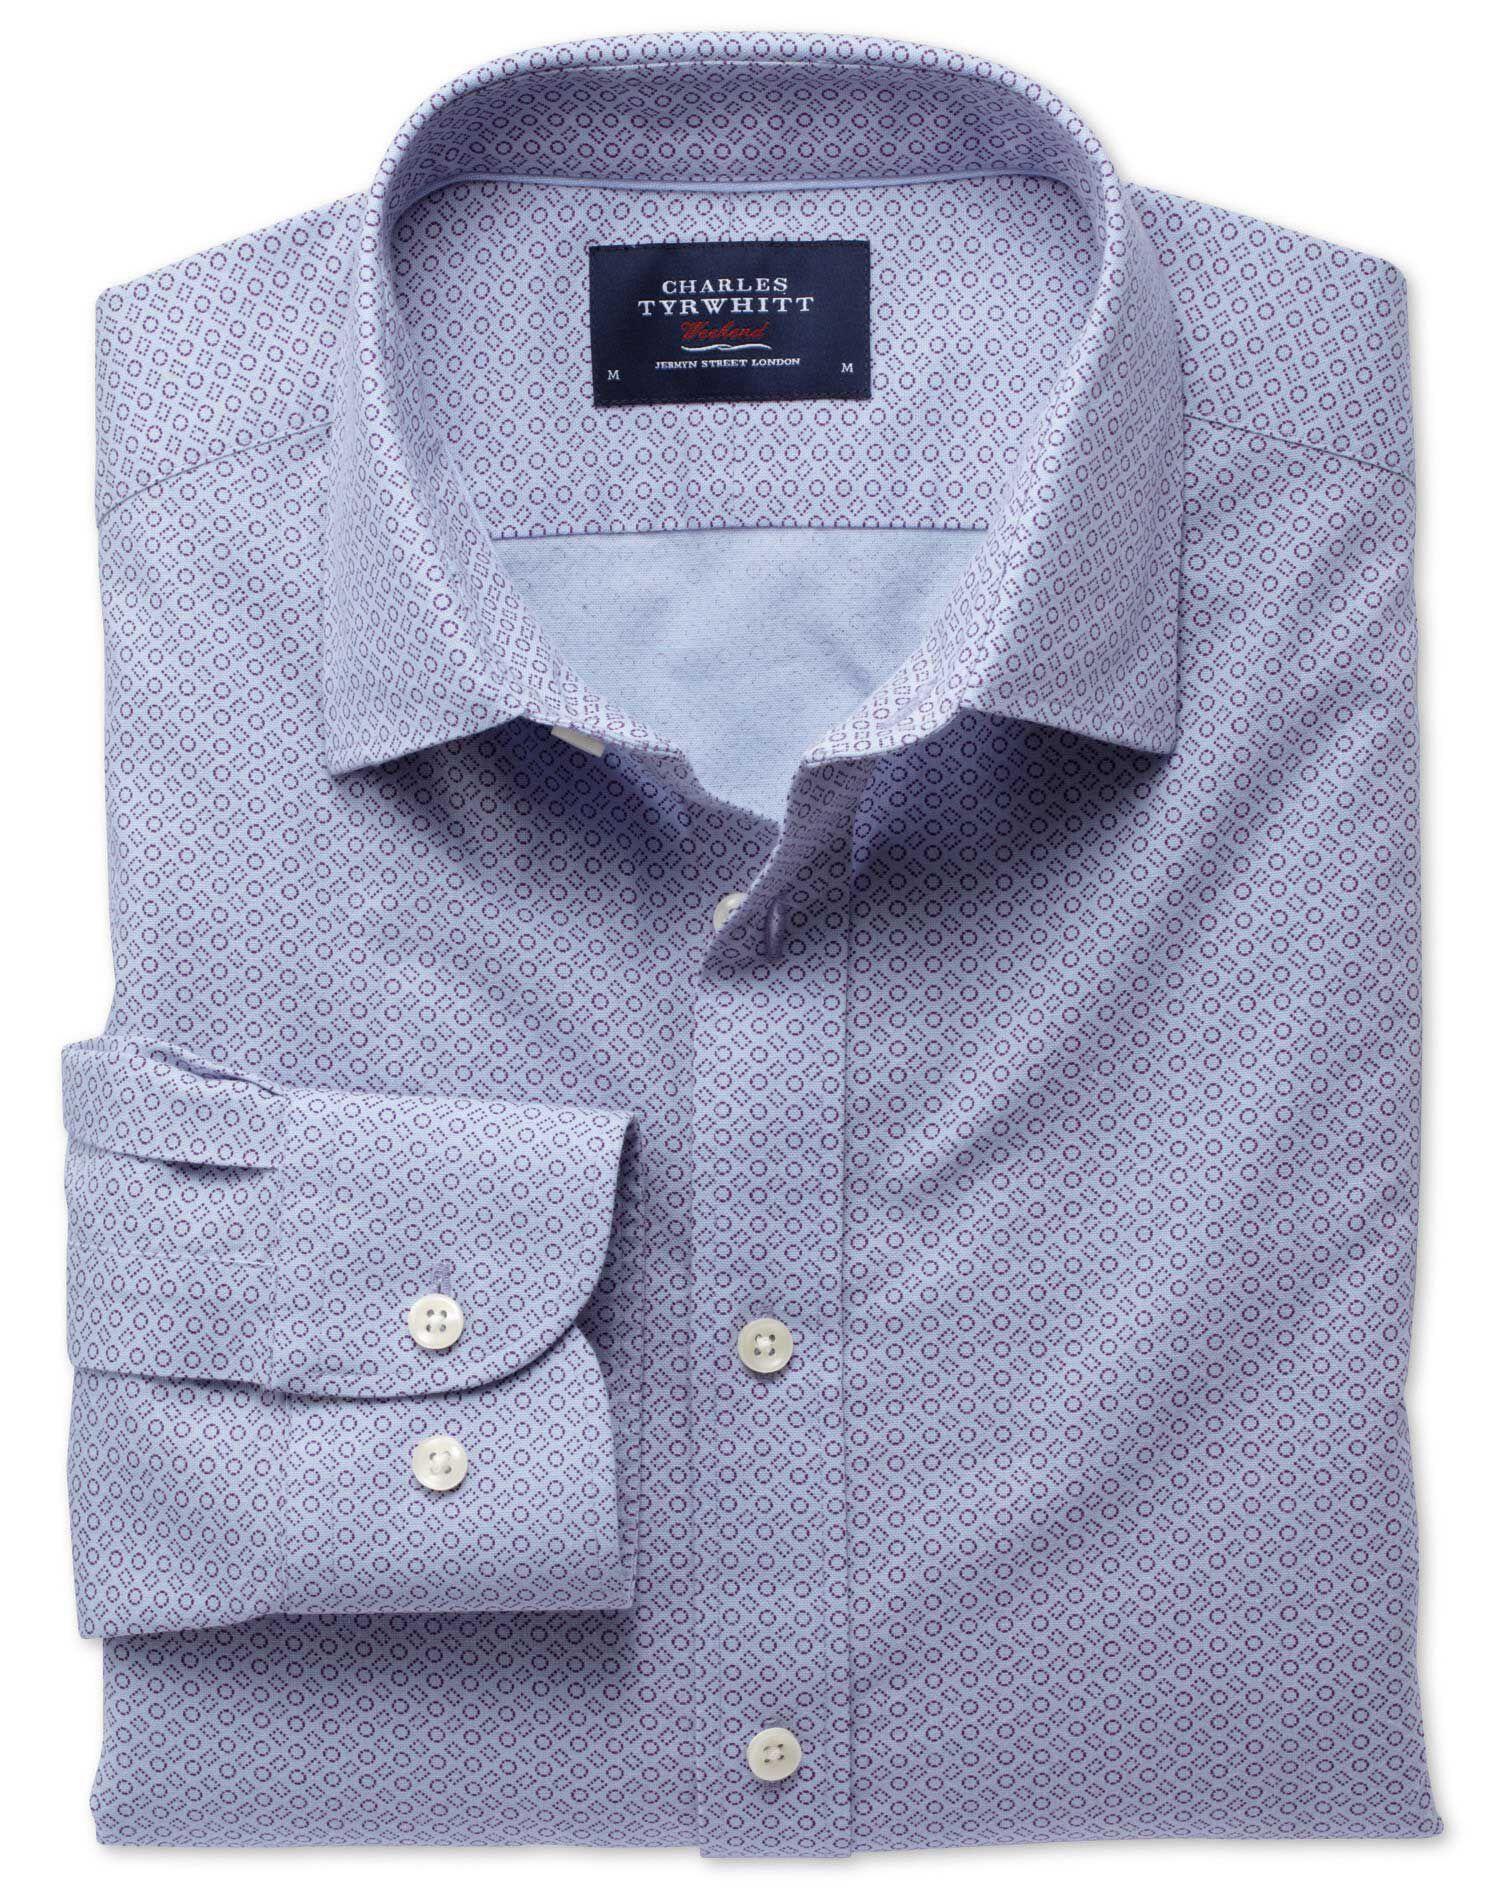 Slim Fit Sky Blue and Purple Geometric Print Cotton Shirt Single Cuff Size Large by Charles Tyrwhitt